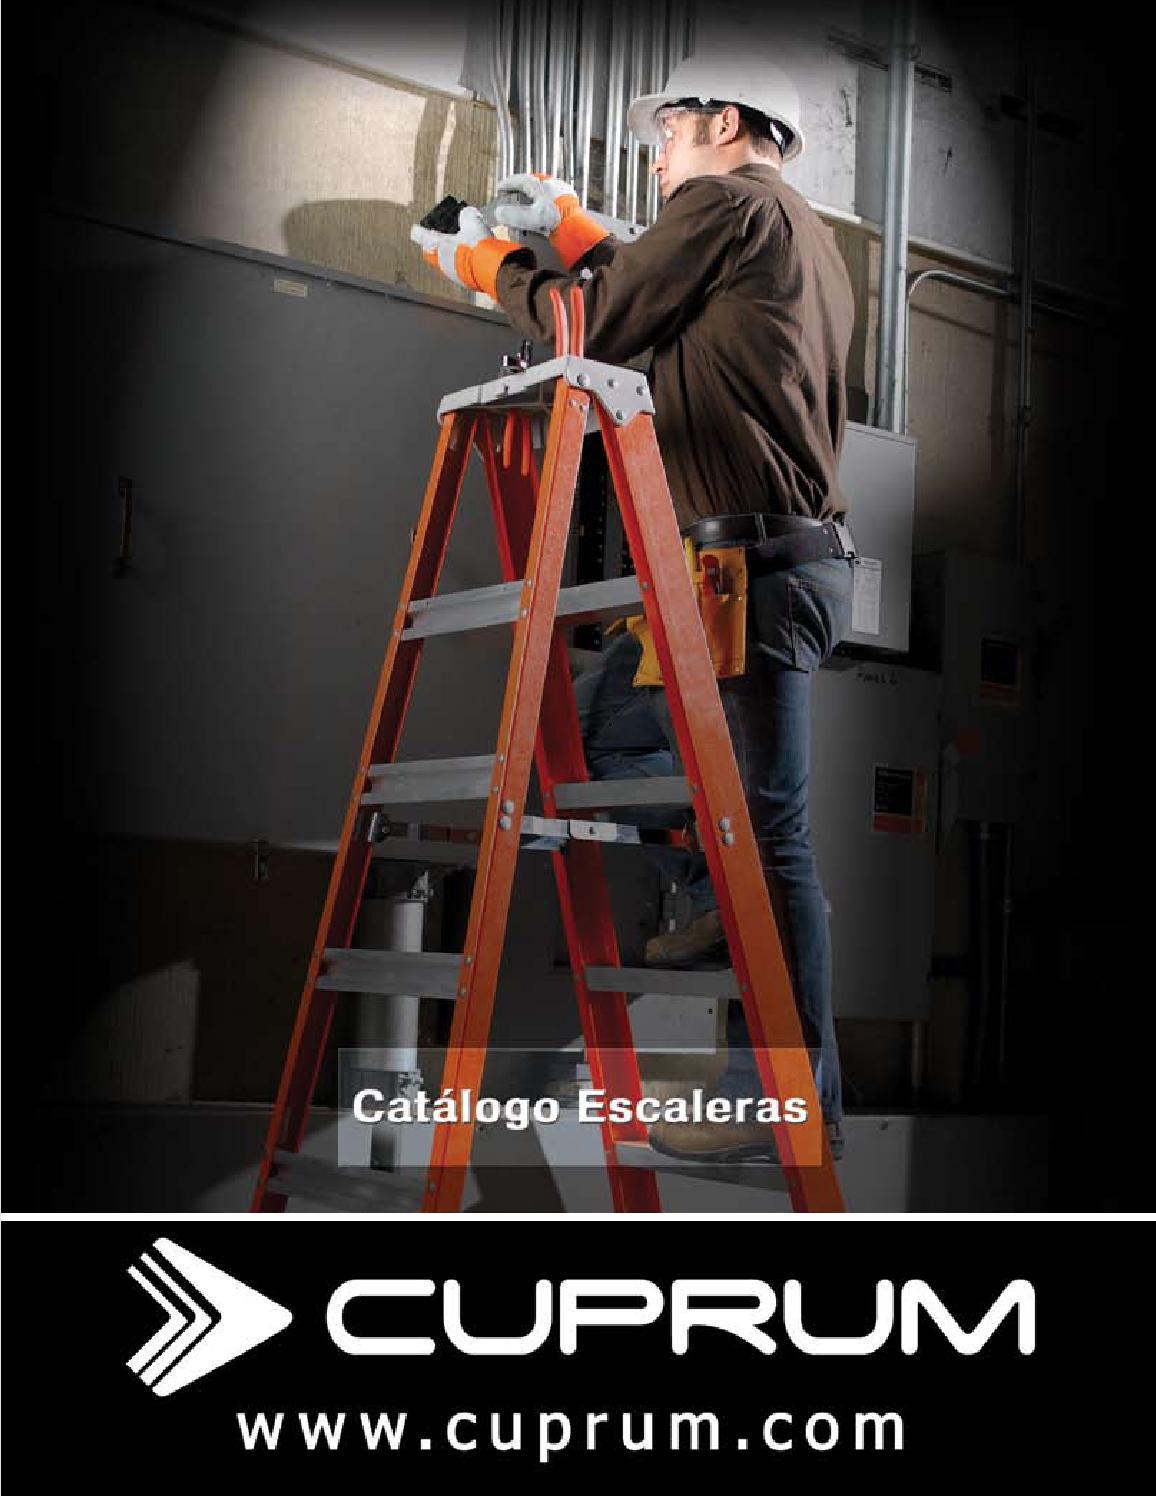 Issuu cat logo escaleras cuprum by mn del golfo for Escaleras cuprum